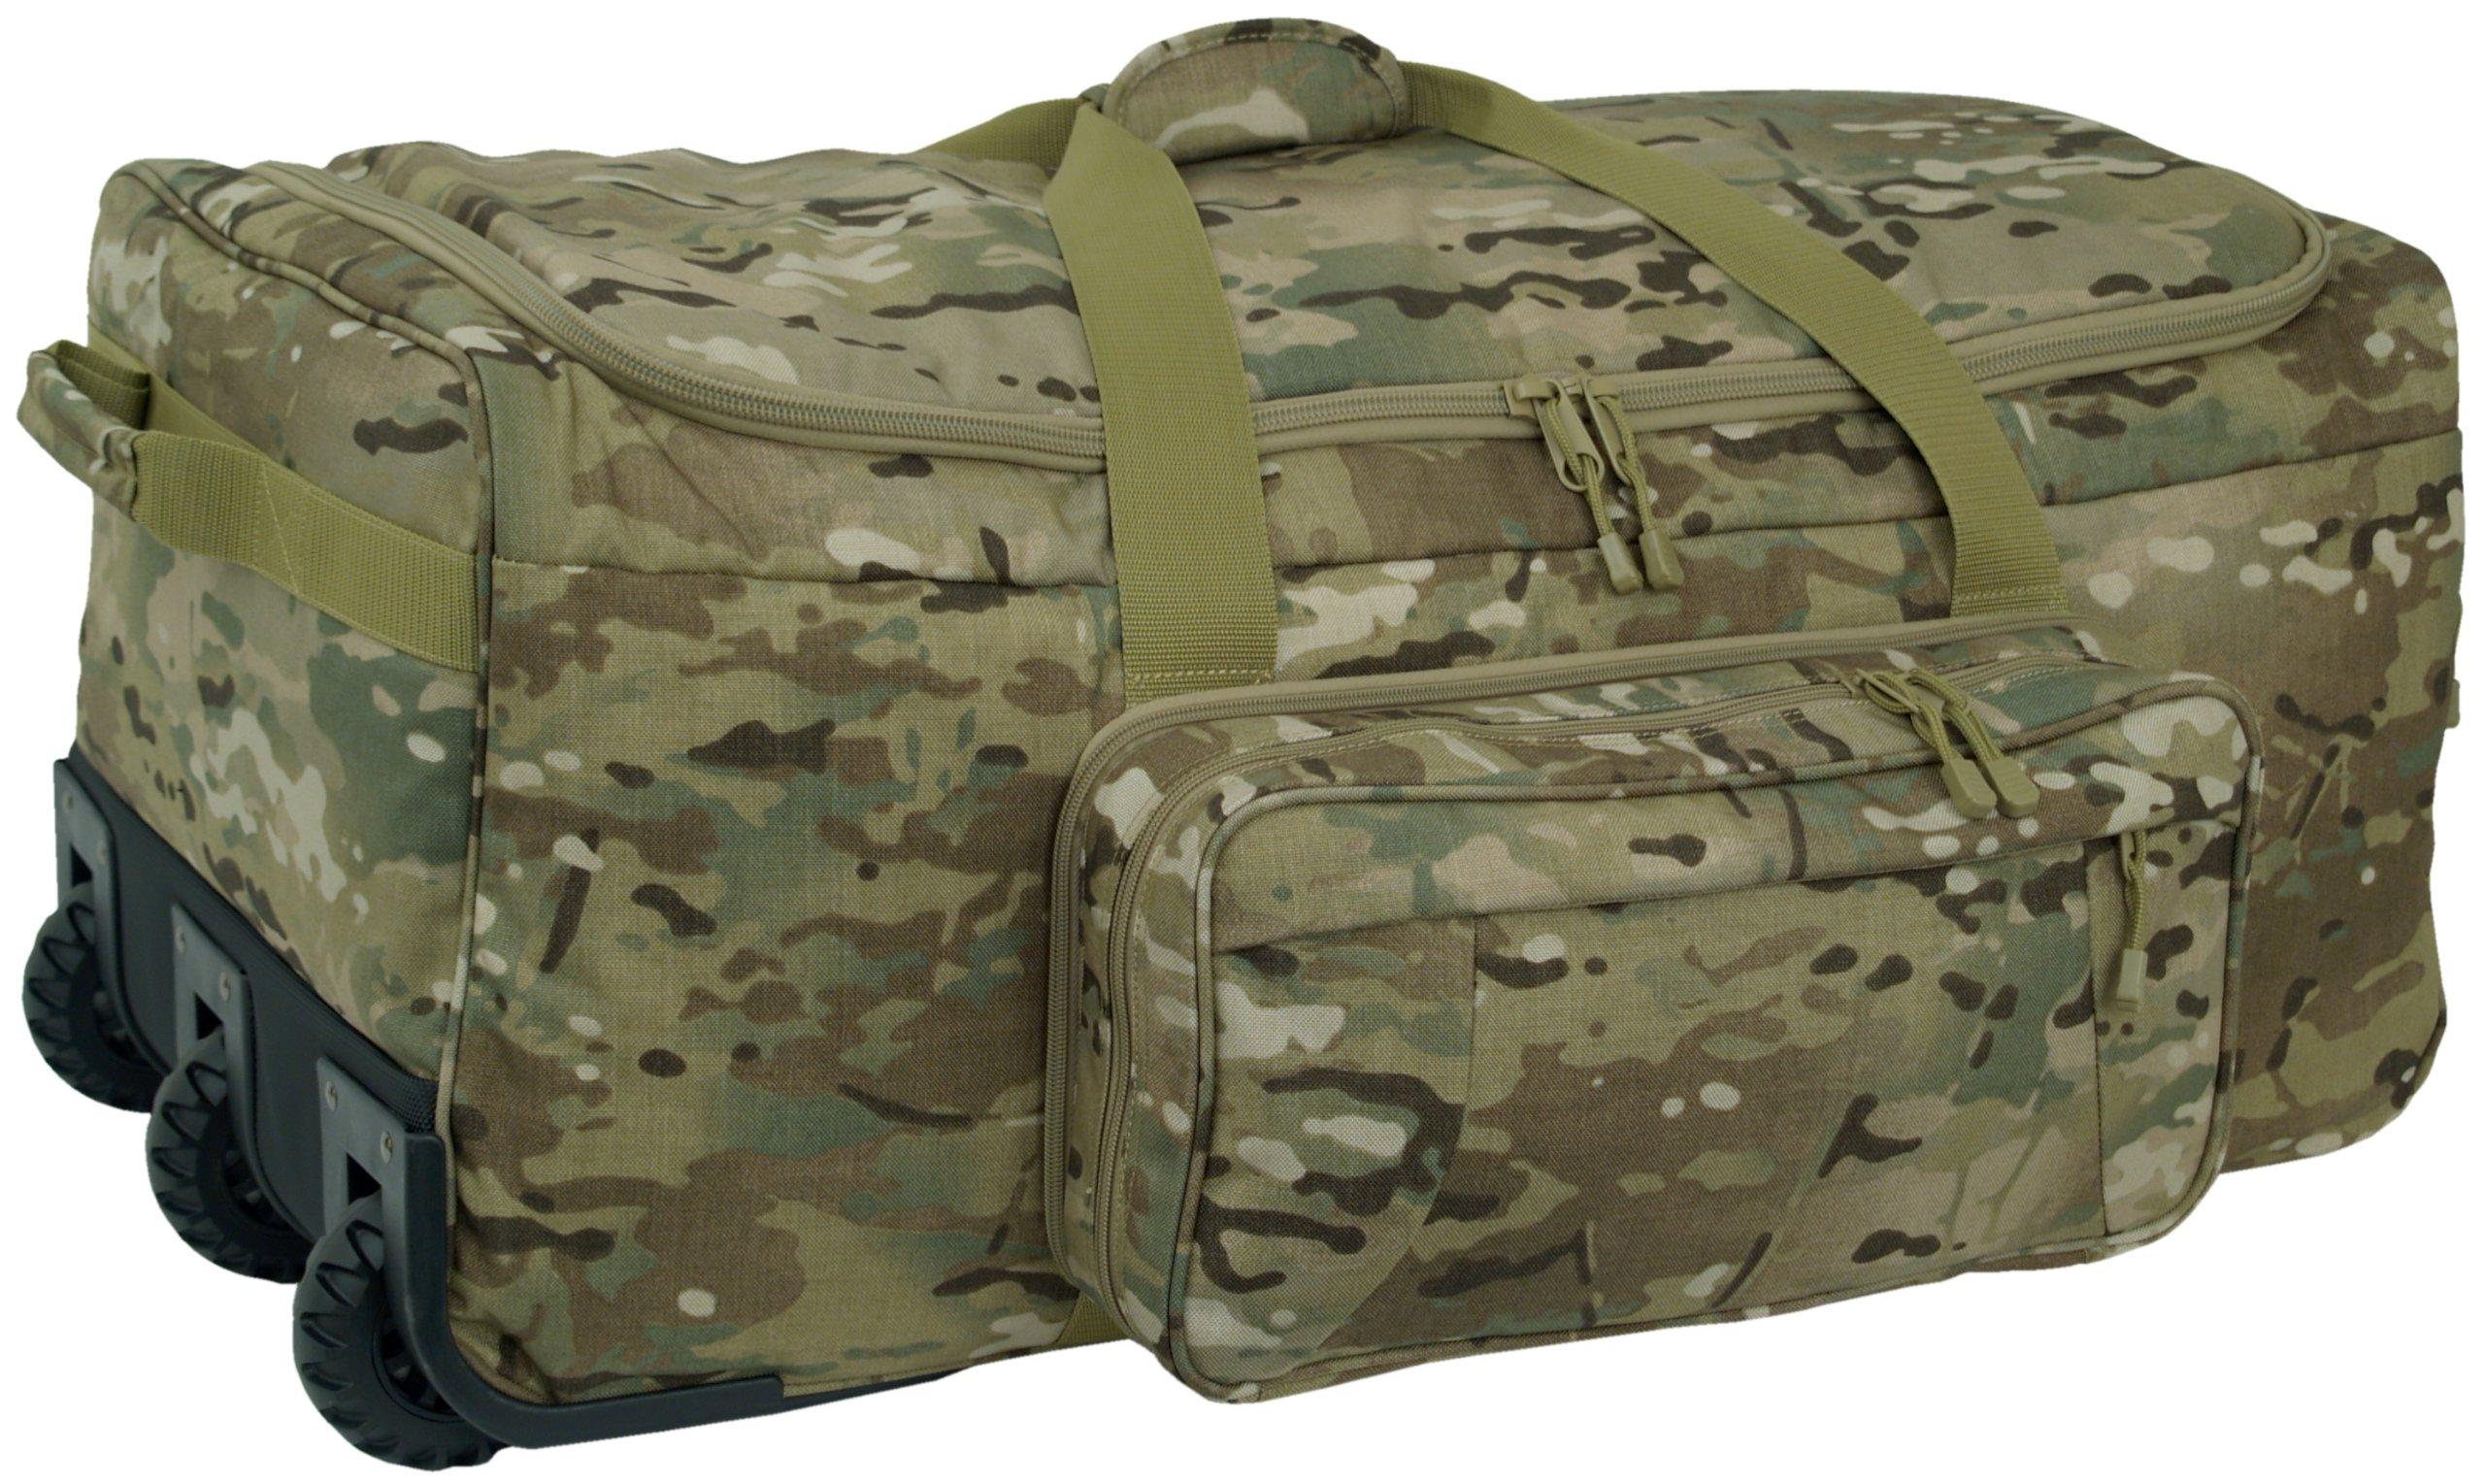 Mercury Tactical Gear Code Alpha Mini Monster Wheeled Deployment Bag Multicam, Multi Cam by Mercury Tactical Gear